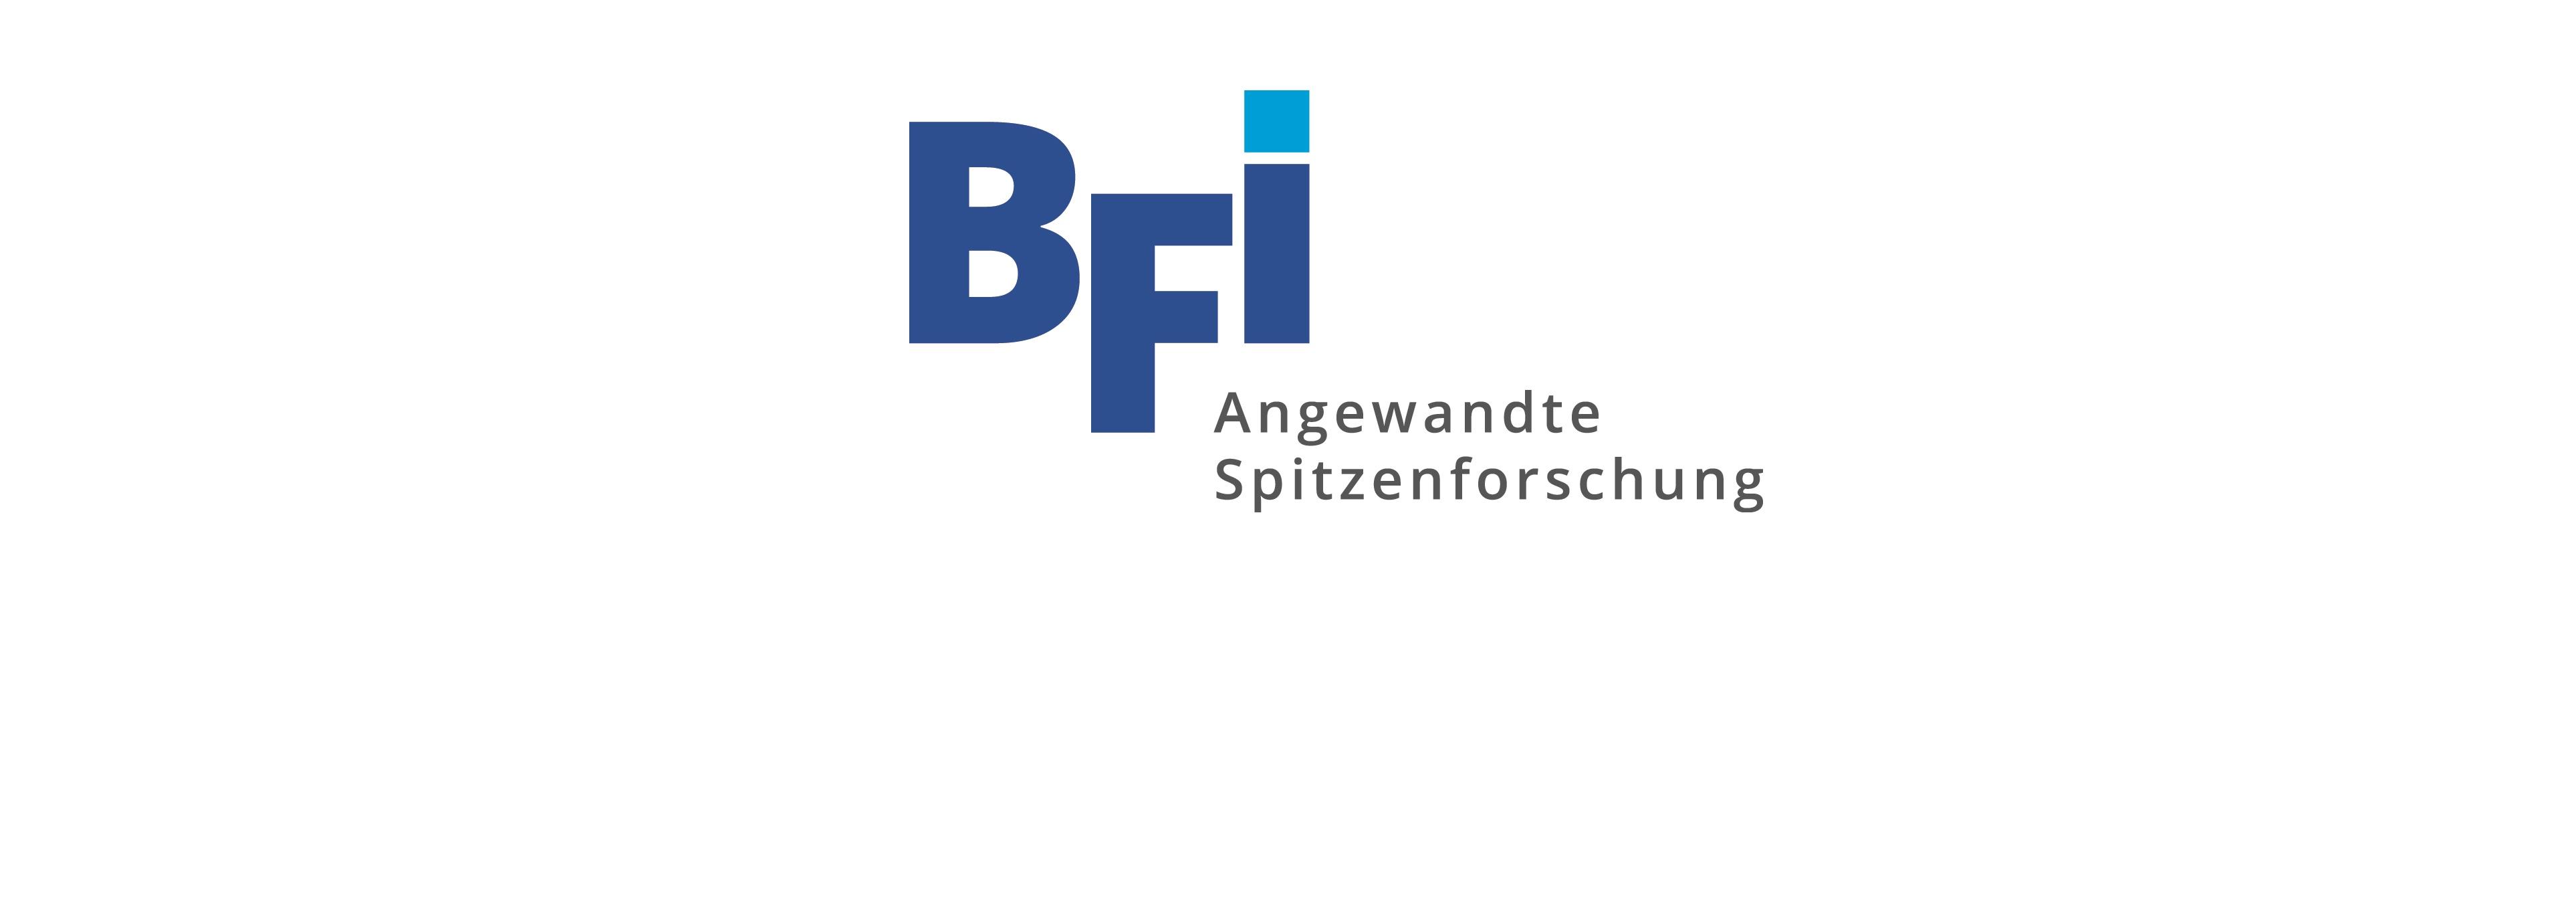 logo BFI Meldung